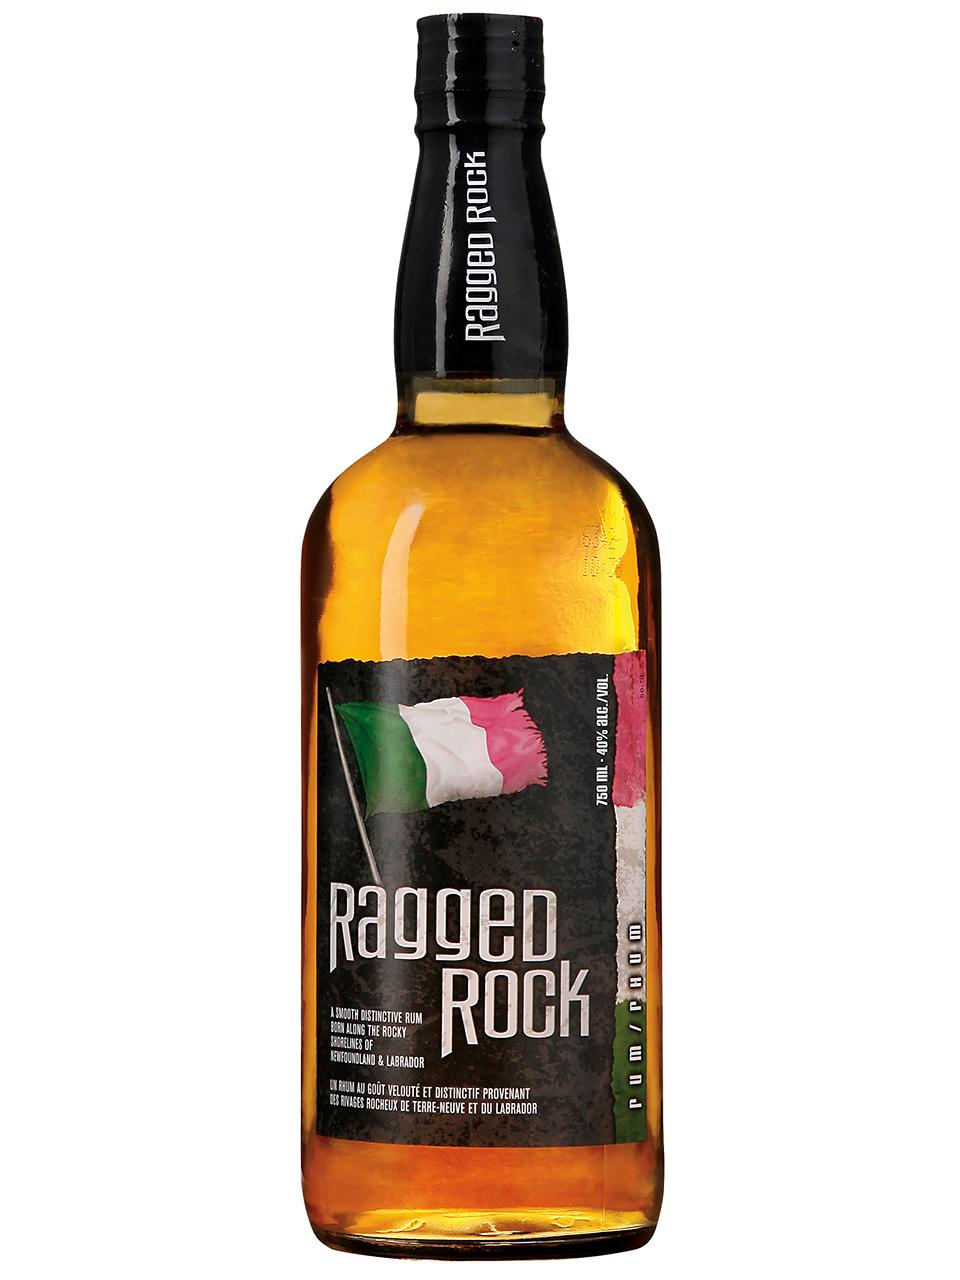 Ragged Rock Rum